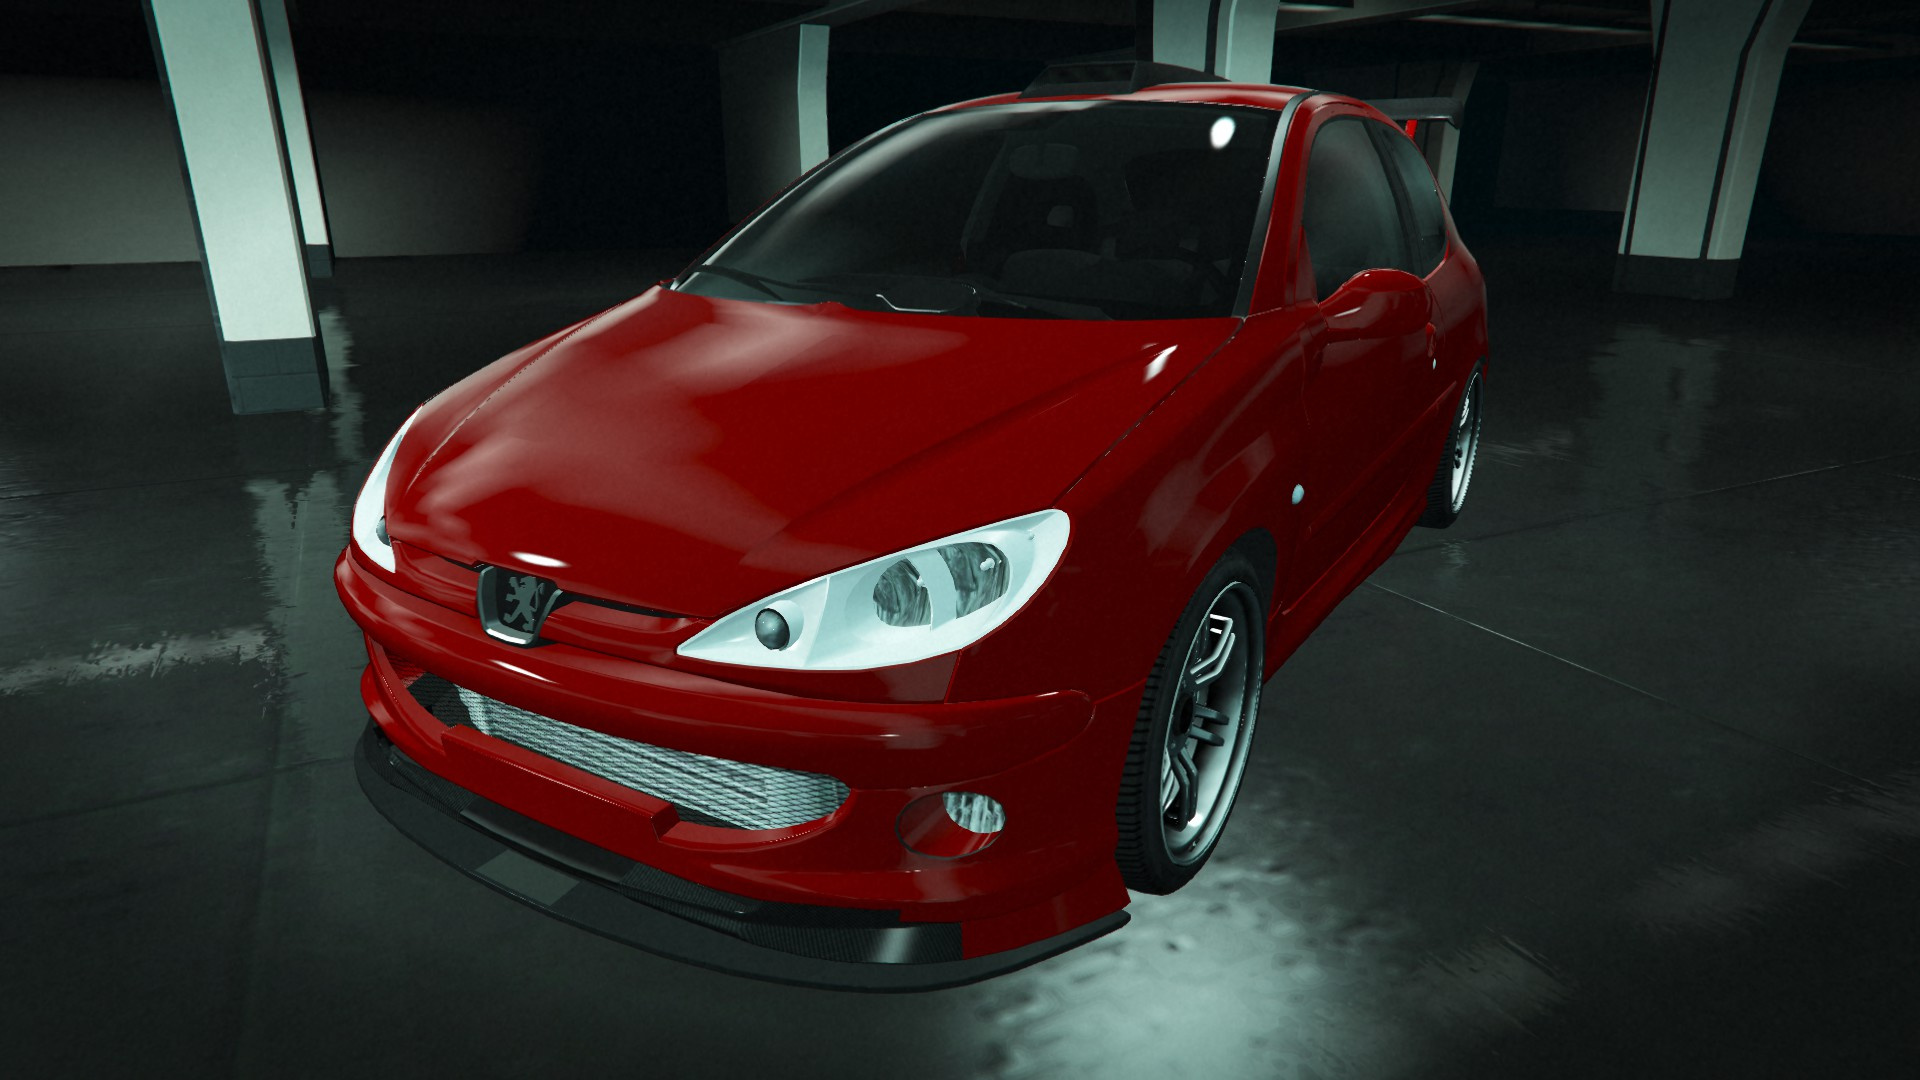 Peugeot 206 Gti Add On Tuning Oiv Gta5 Mods Com